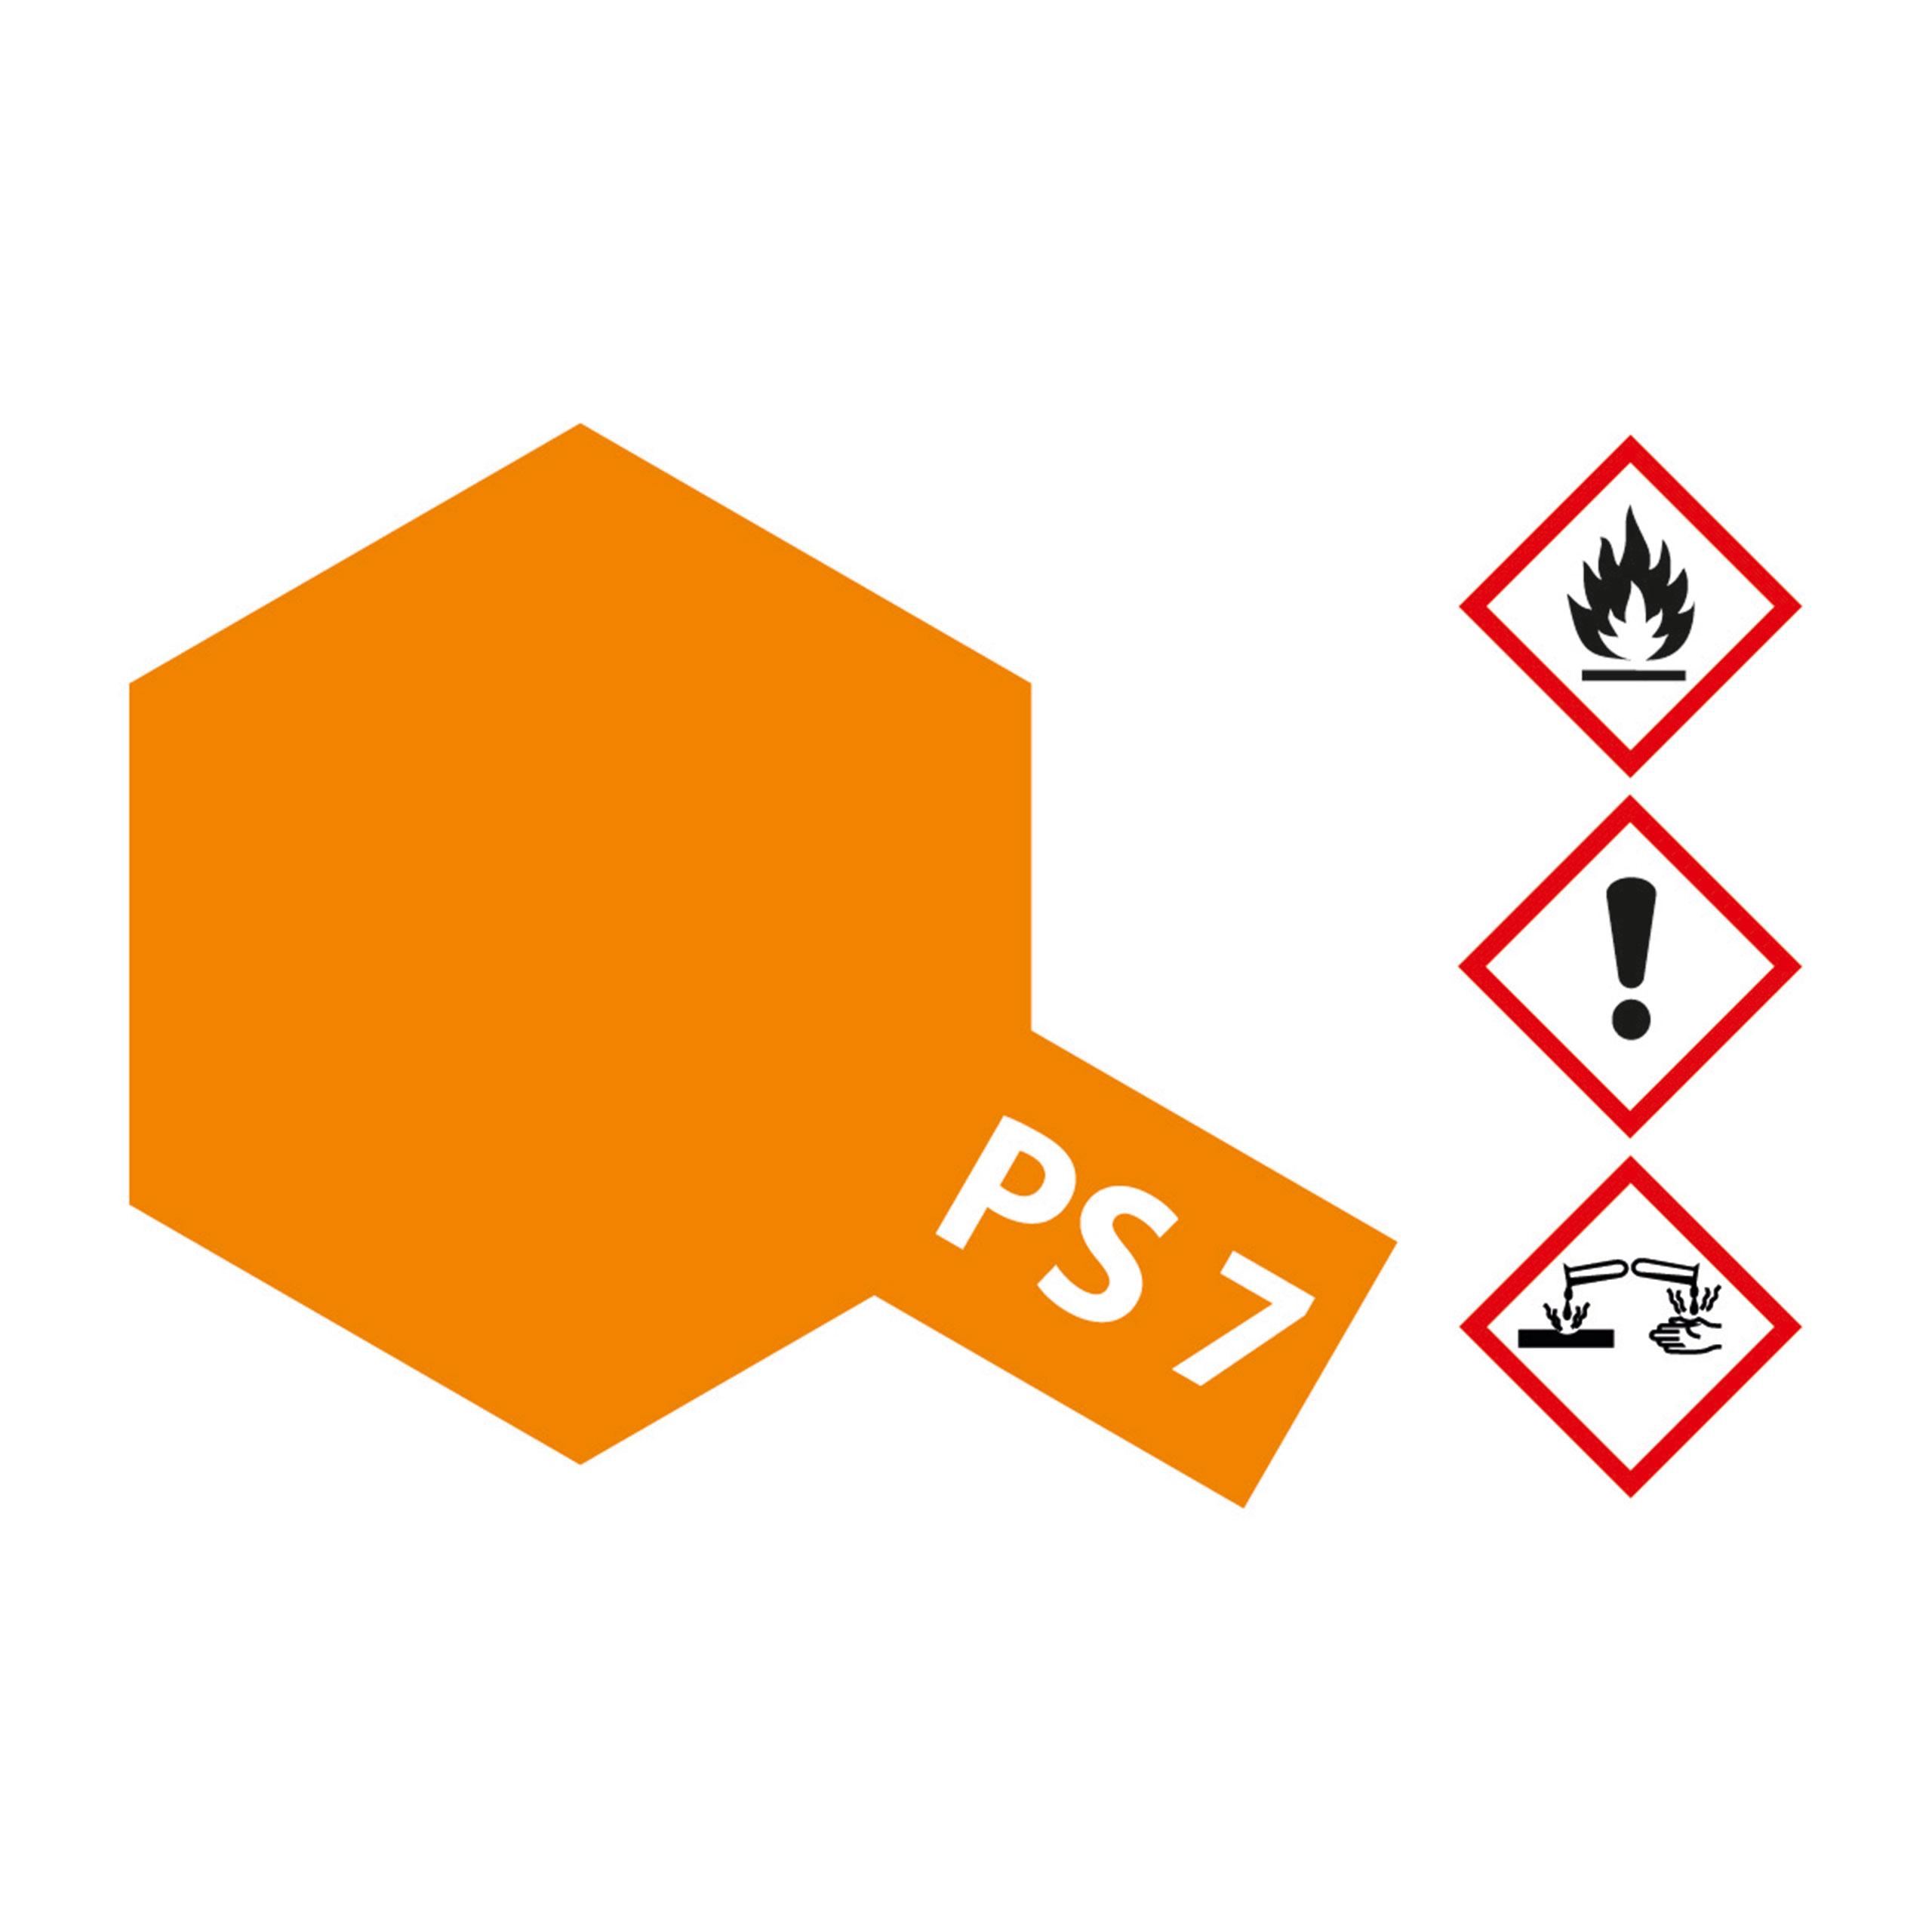 PS-7 Orange Polycarbonat - 100ml Sprayfarbe Lexan - Tamiya 300086007